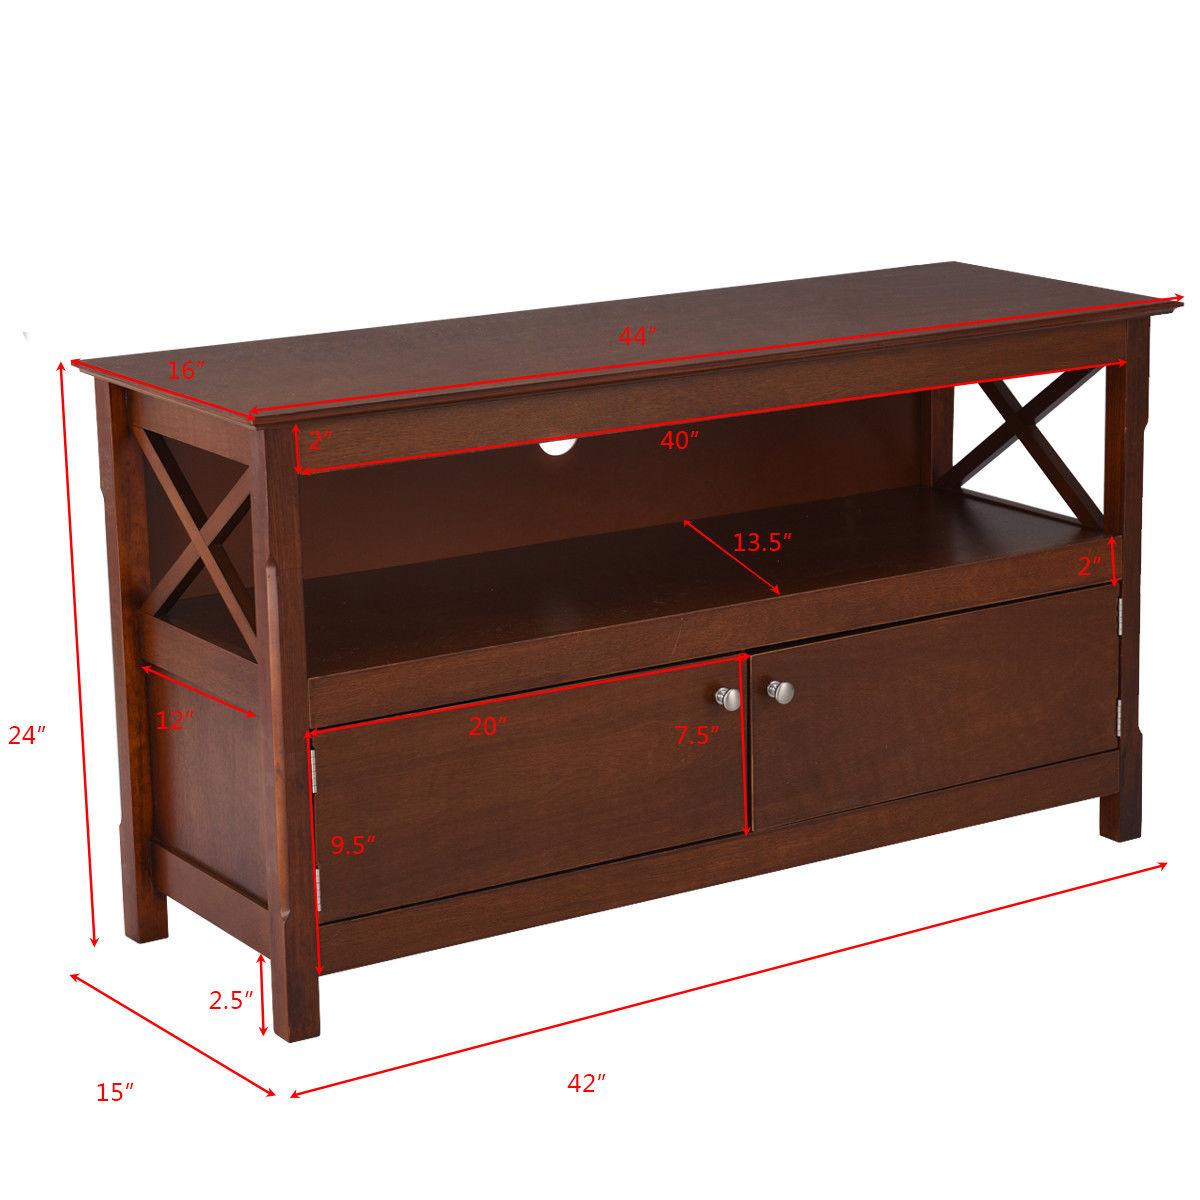 "44"" TV Stand Console Wooden Storage Cabinet Shelf Media Center Stand - image 2 de 9"